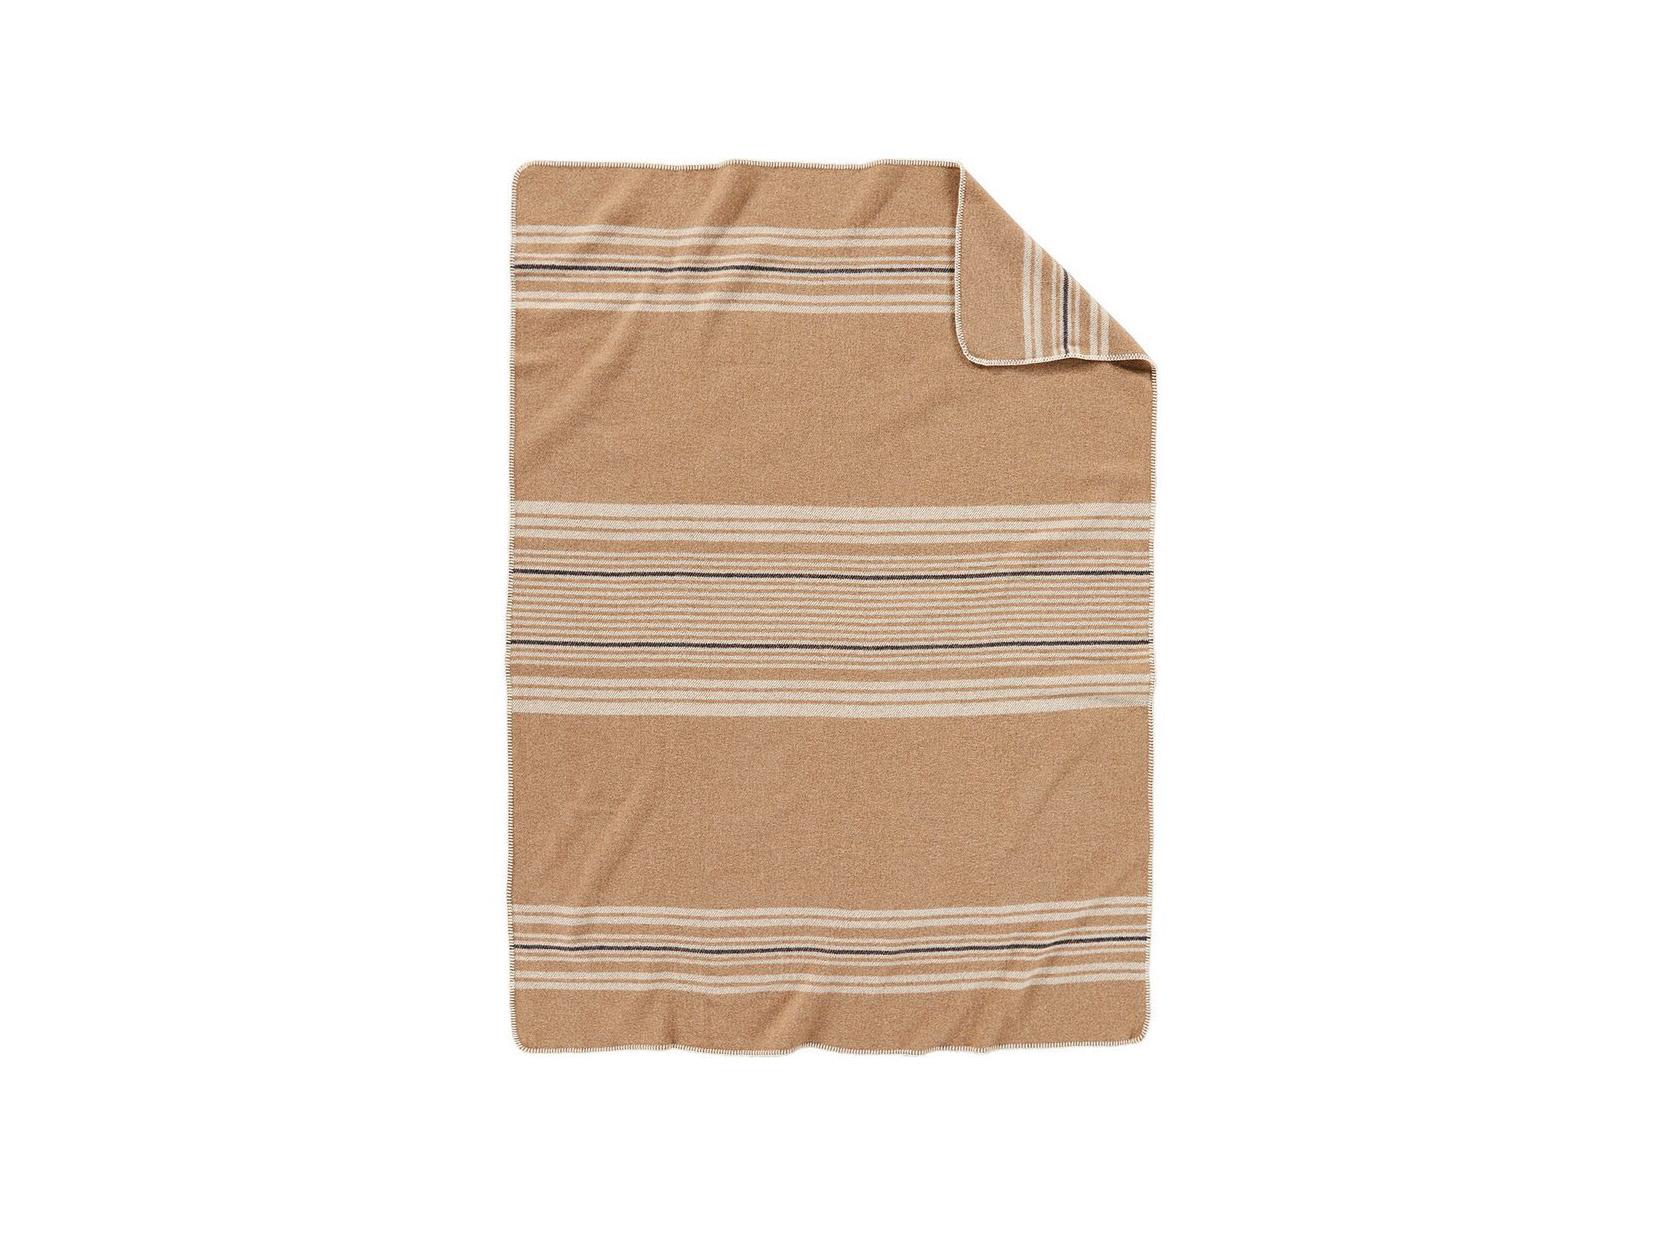 Best Throw Blankets - Pendleton Eco-Wool Throw